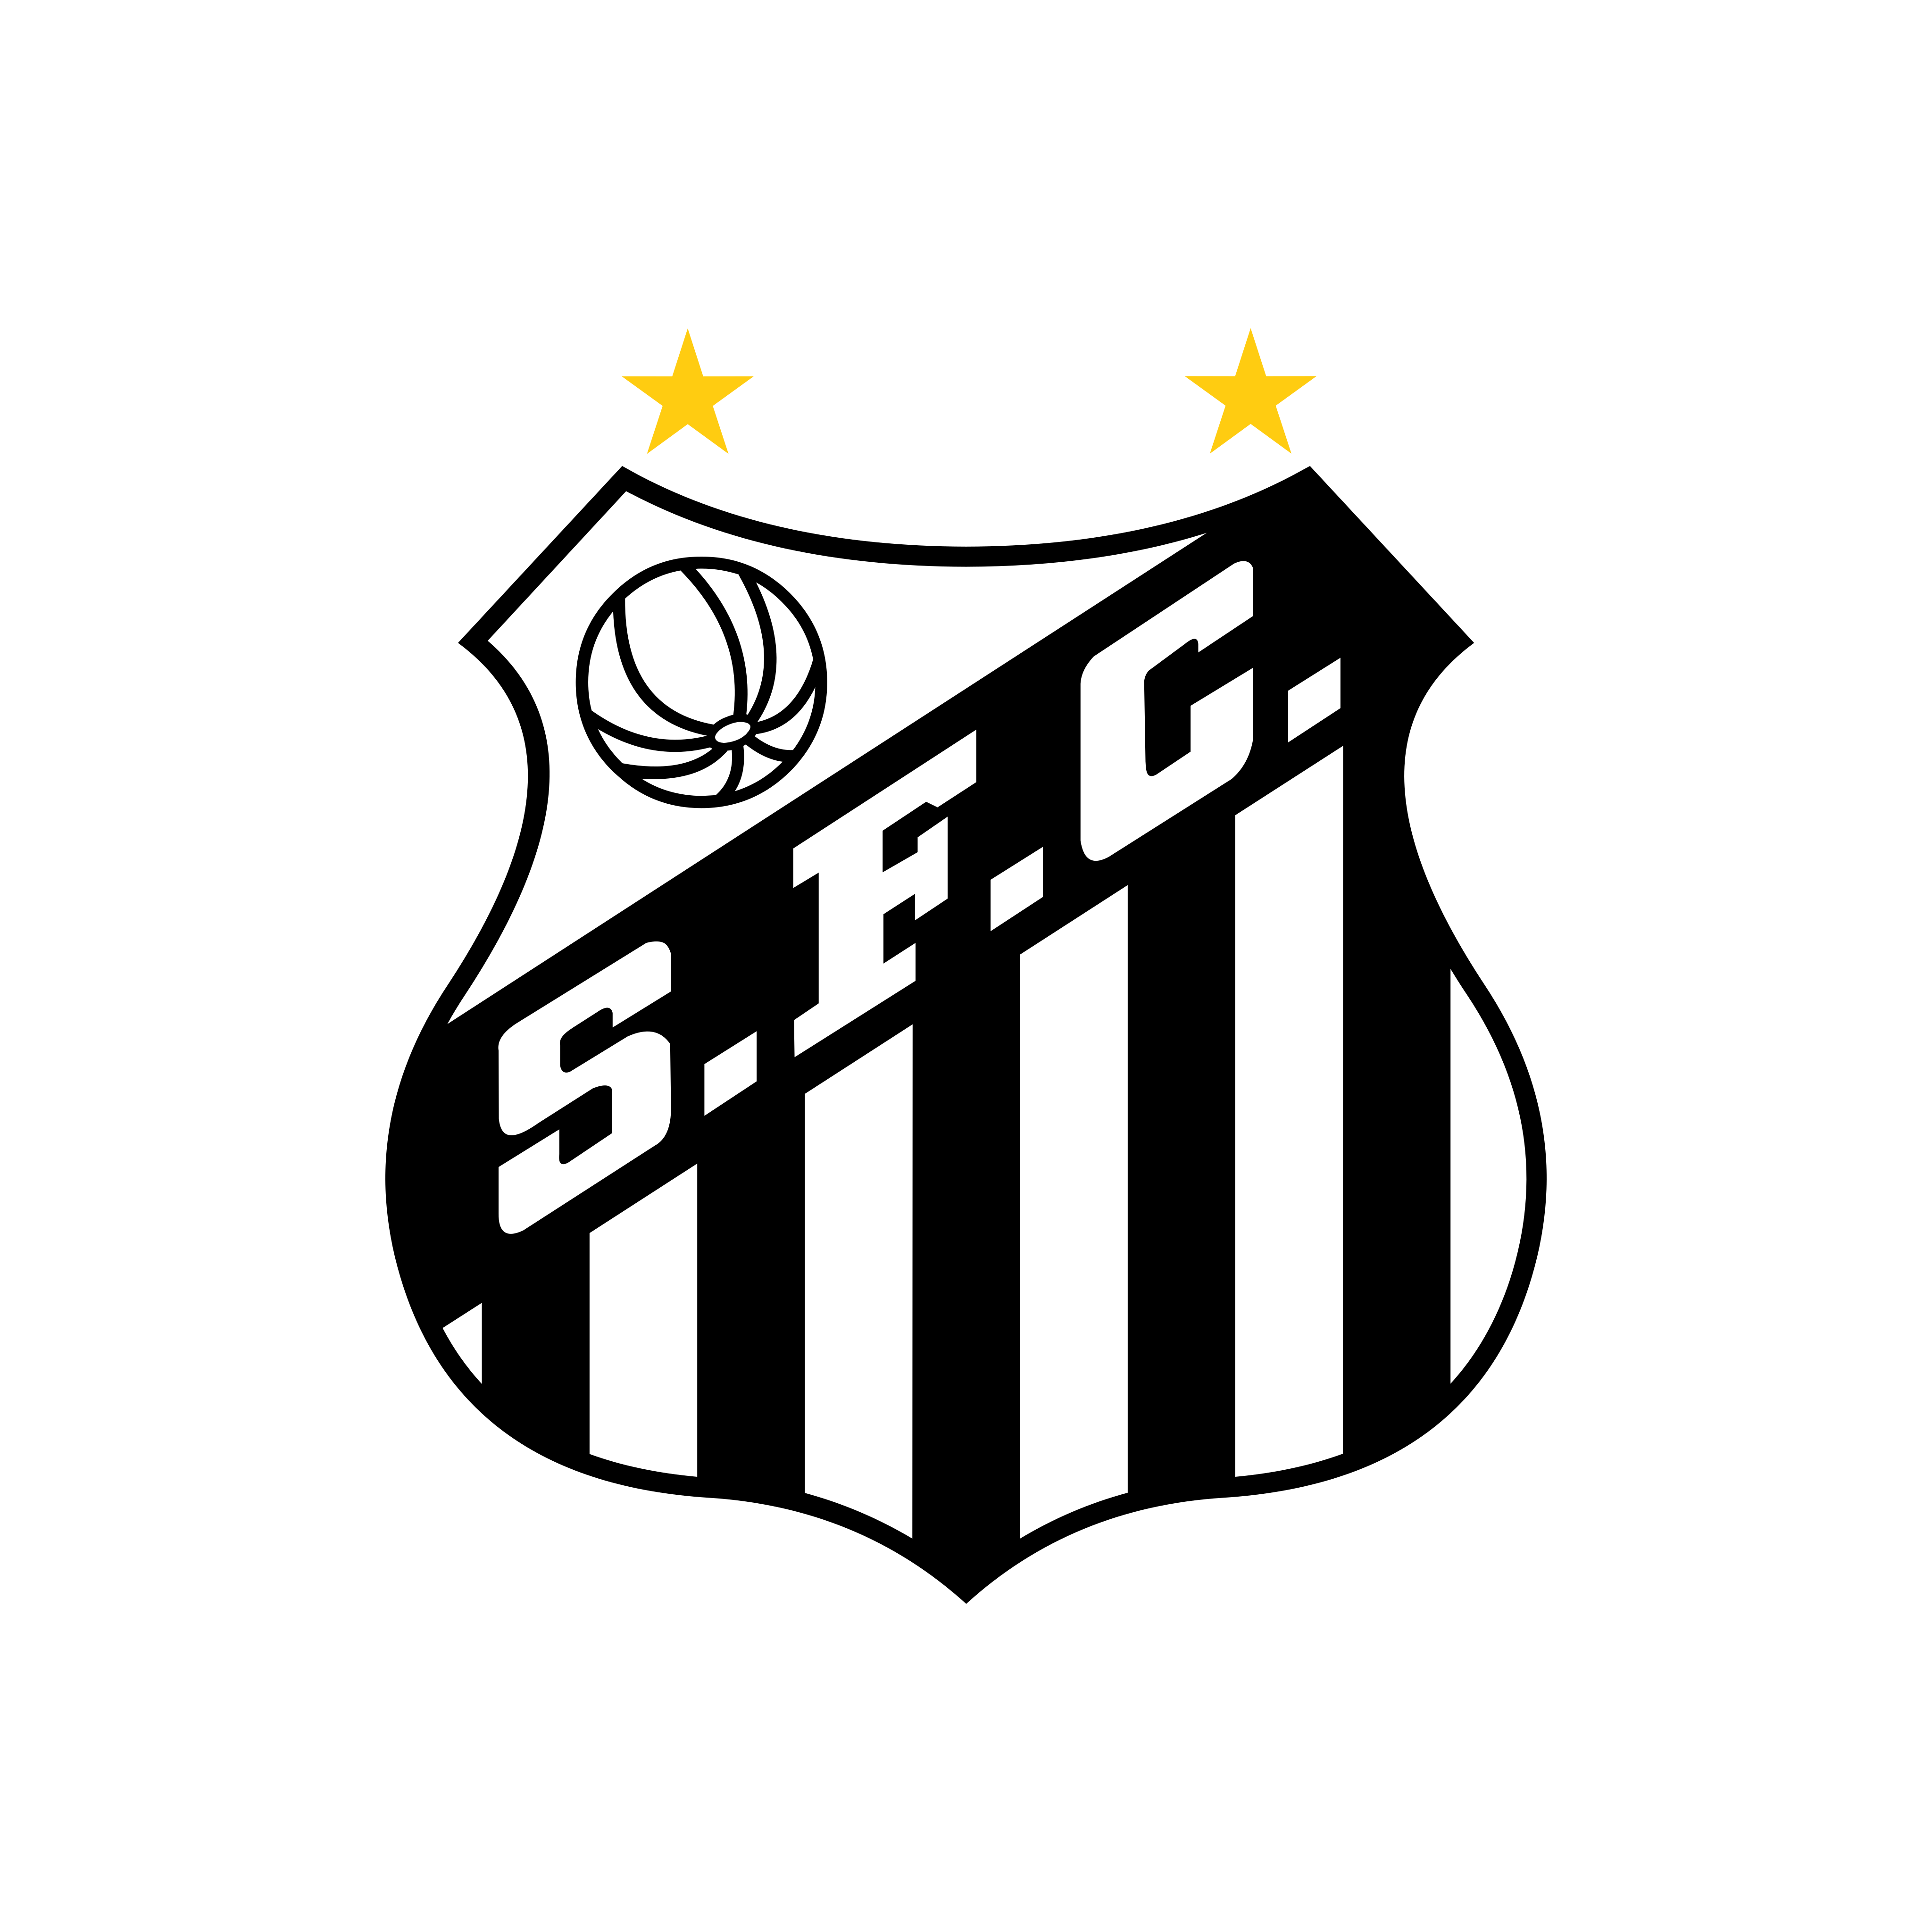 santos logo 0 - Santos FC Logo